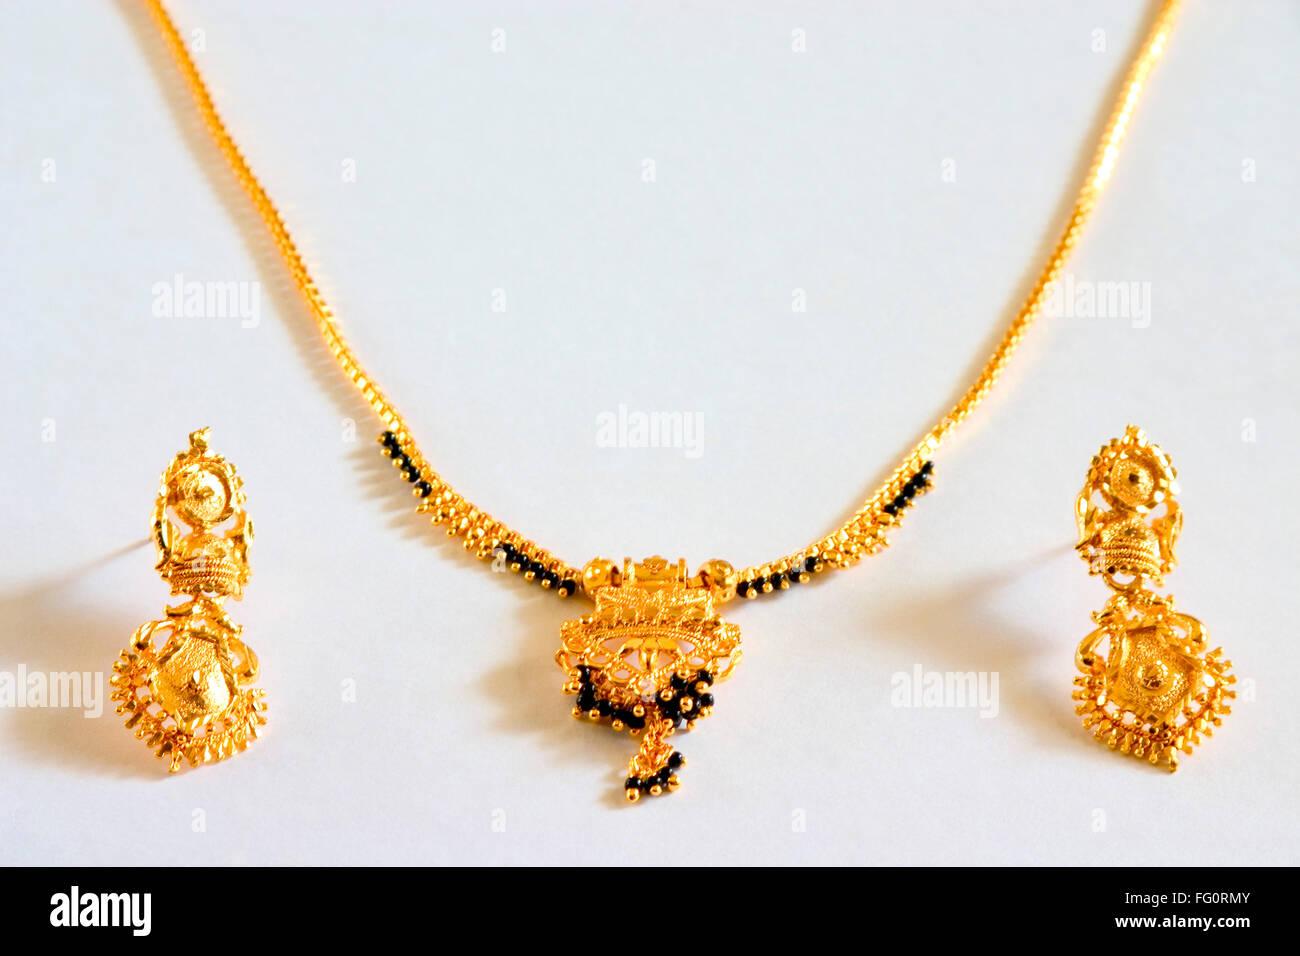 Concept gold black beads necklace mangalsutra Hindu bride symbol